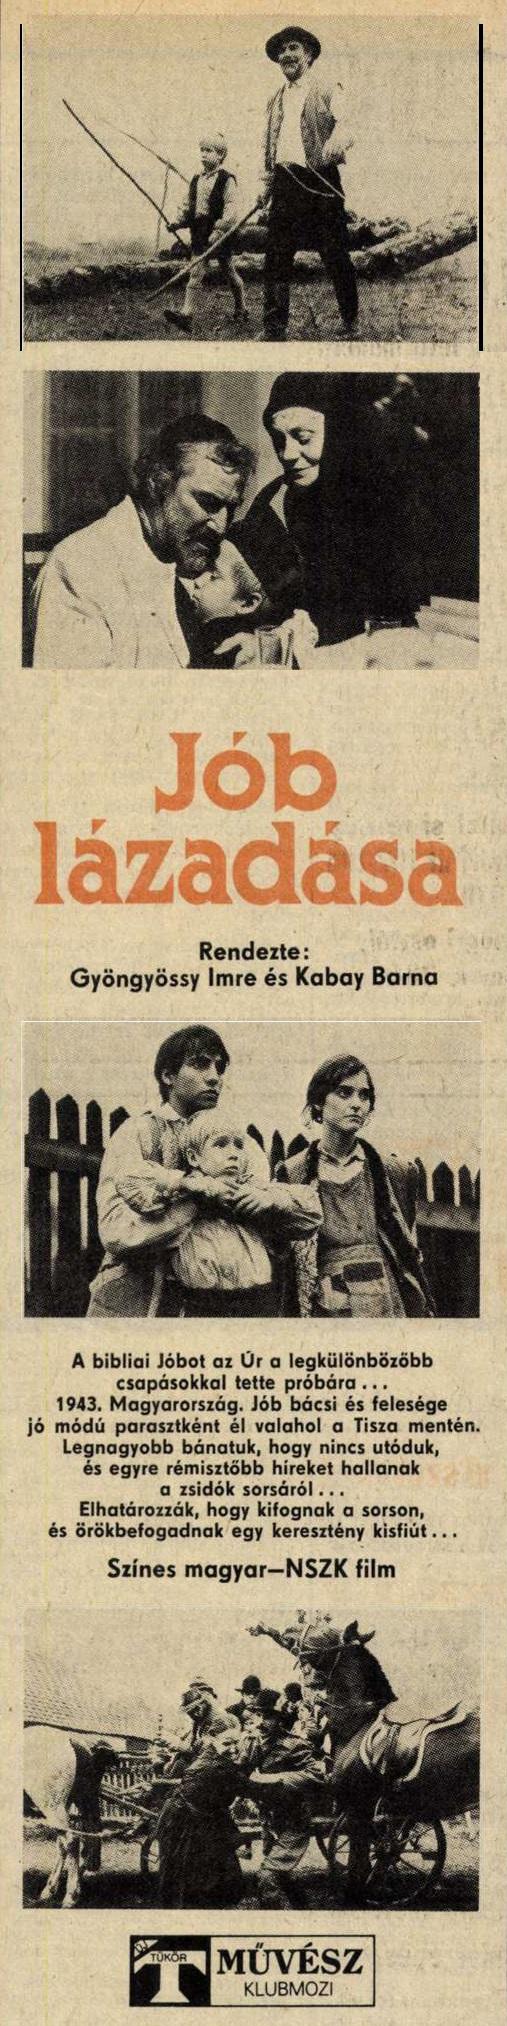 idokapszula_nb_i_1983_84_15_fordulo_mozi.jpg